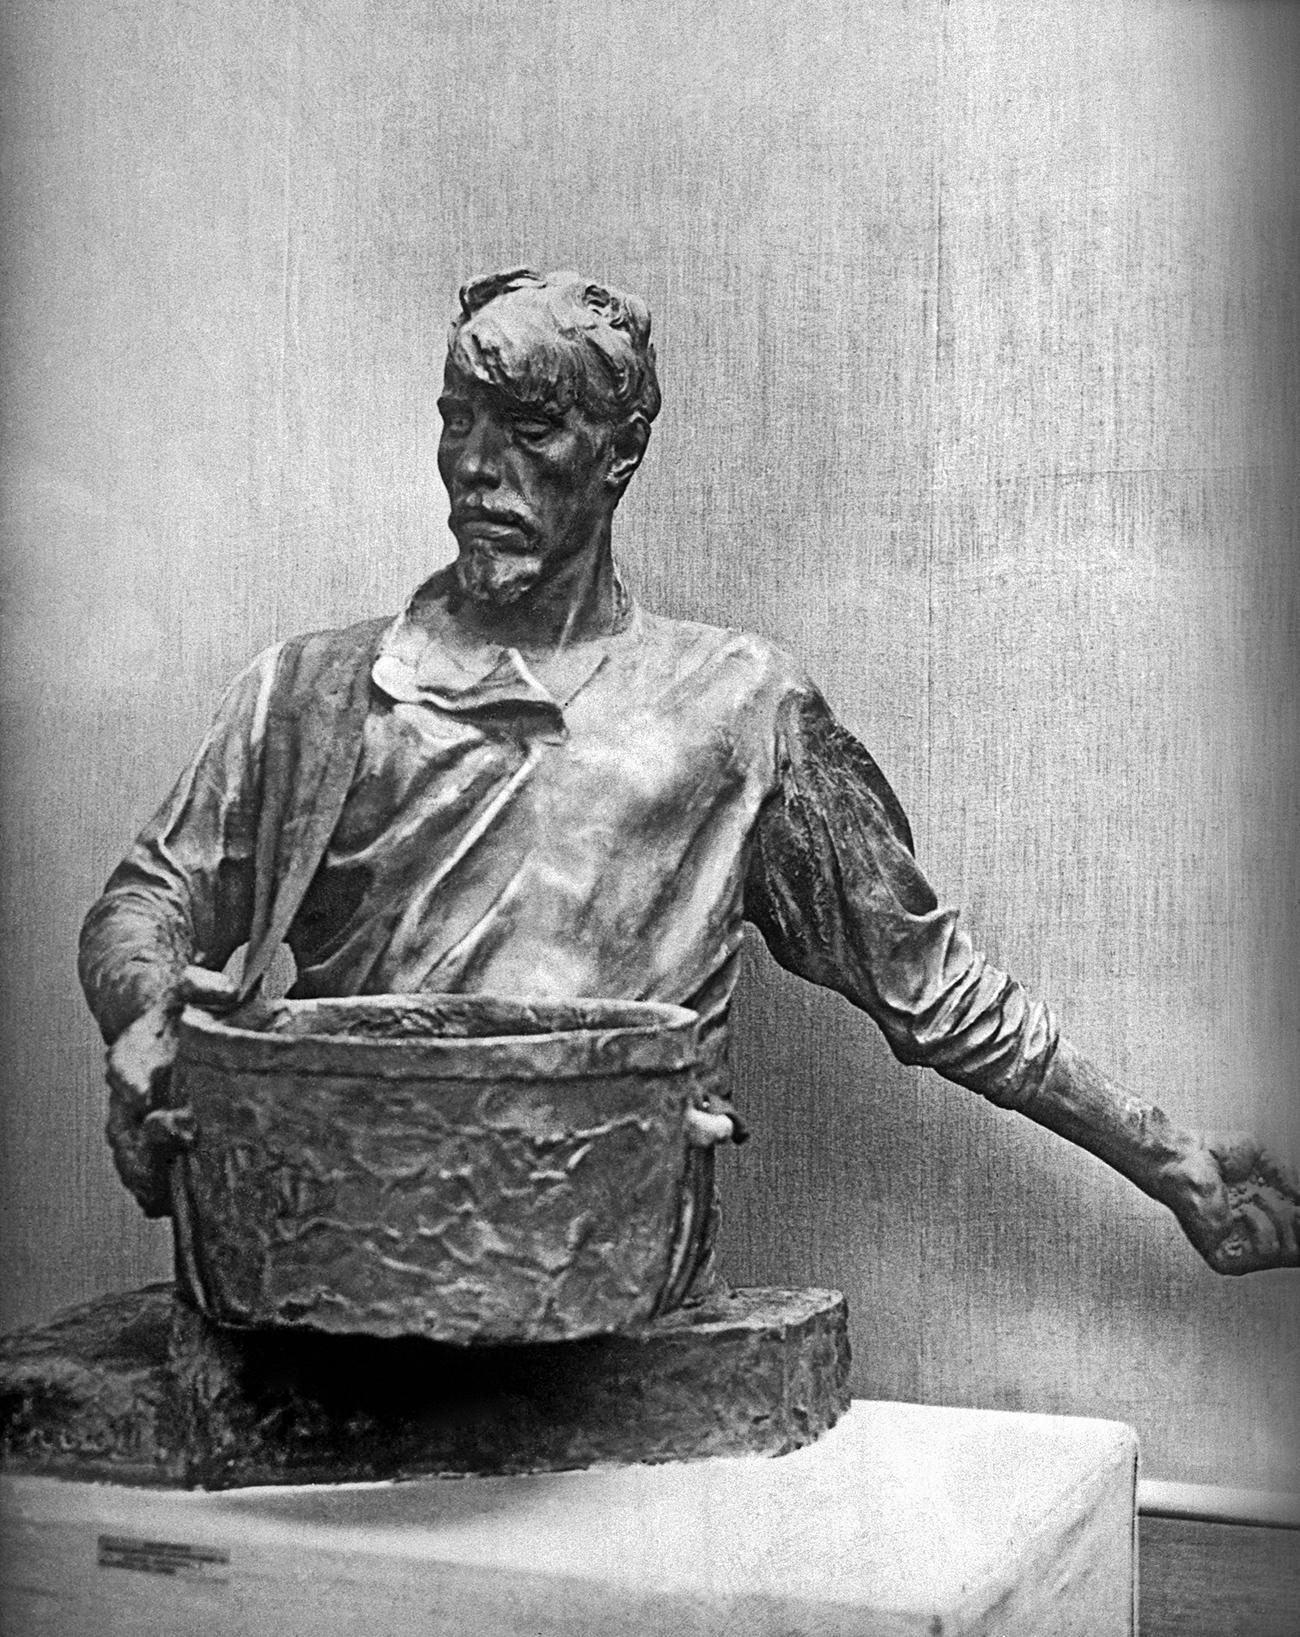 Seedsman, bronze, by artist Ivan Shadr. Source: V. Nikiforov/RIA Novosti